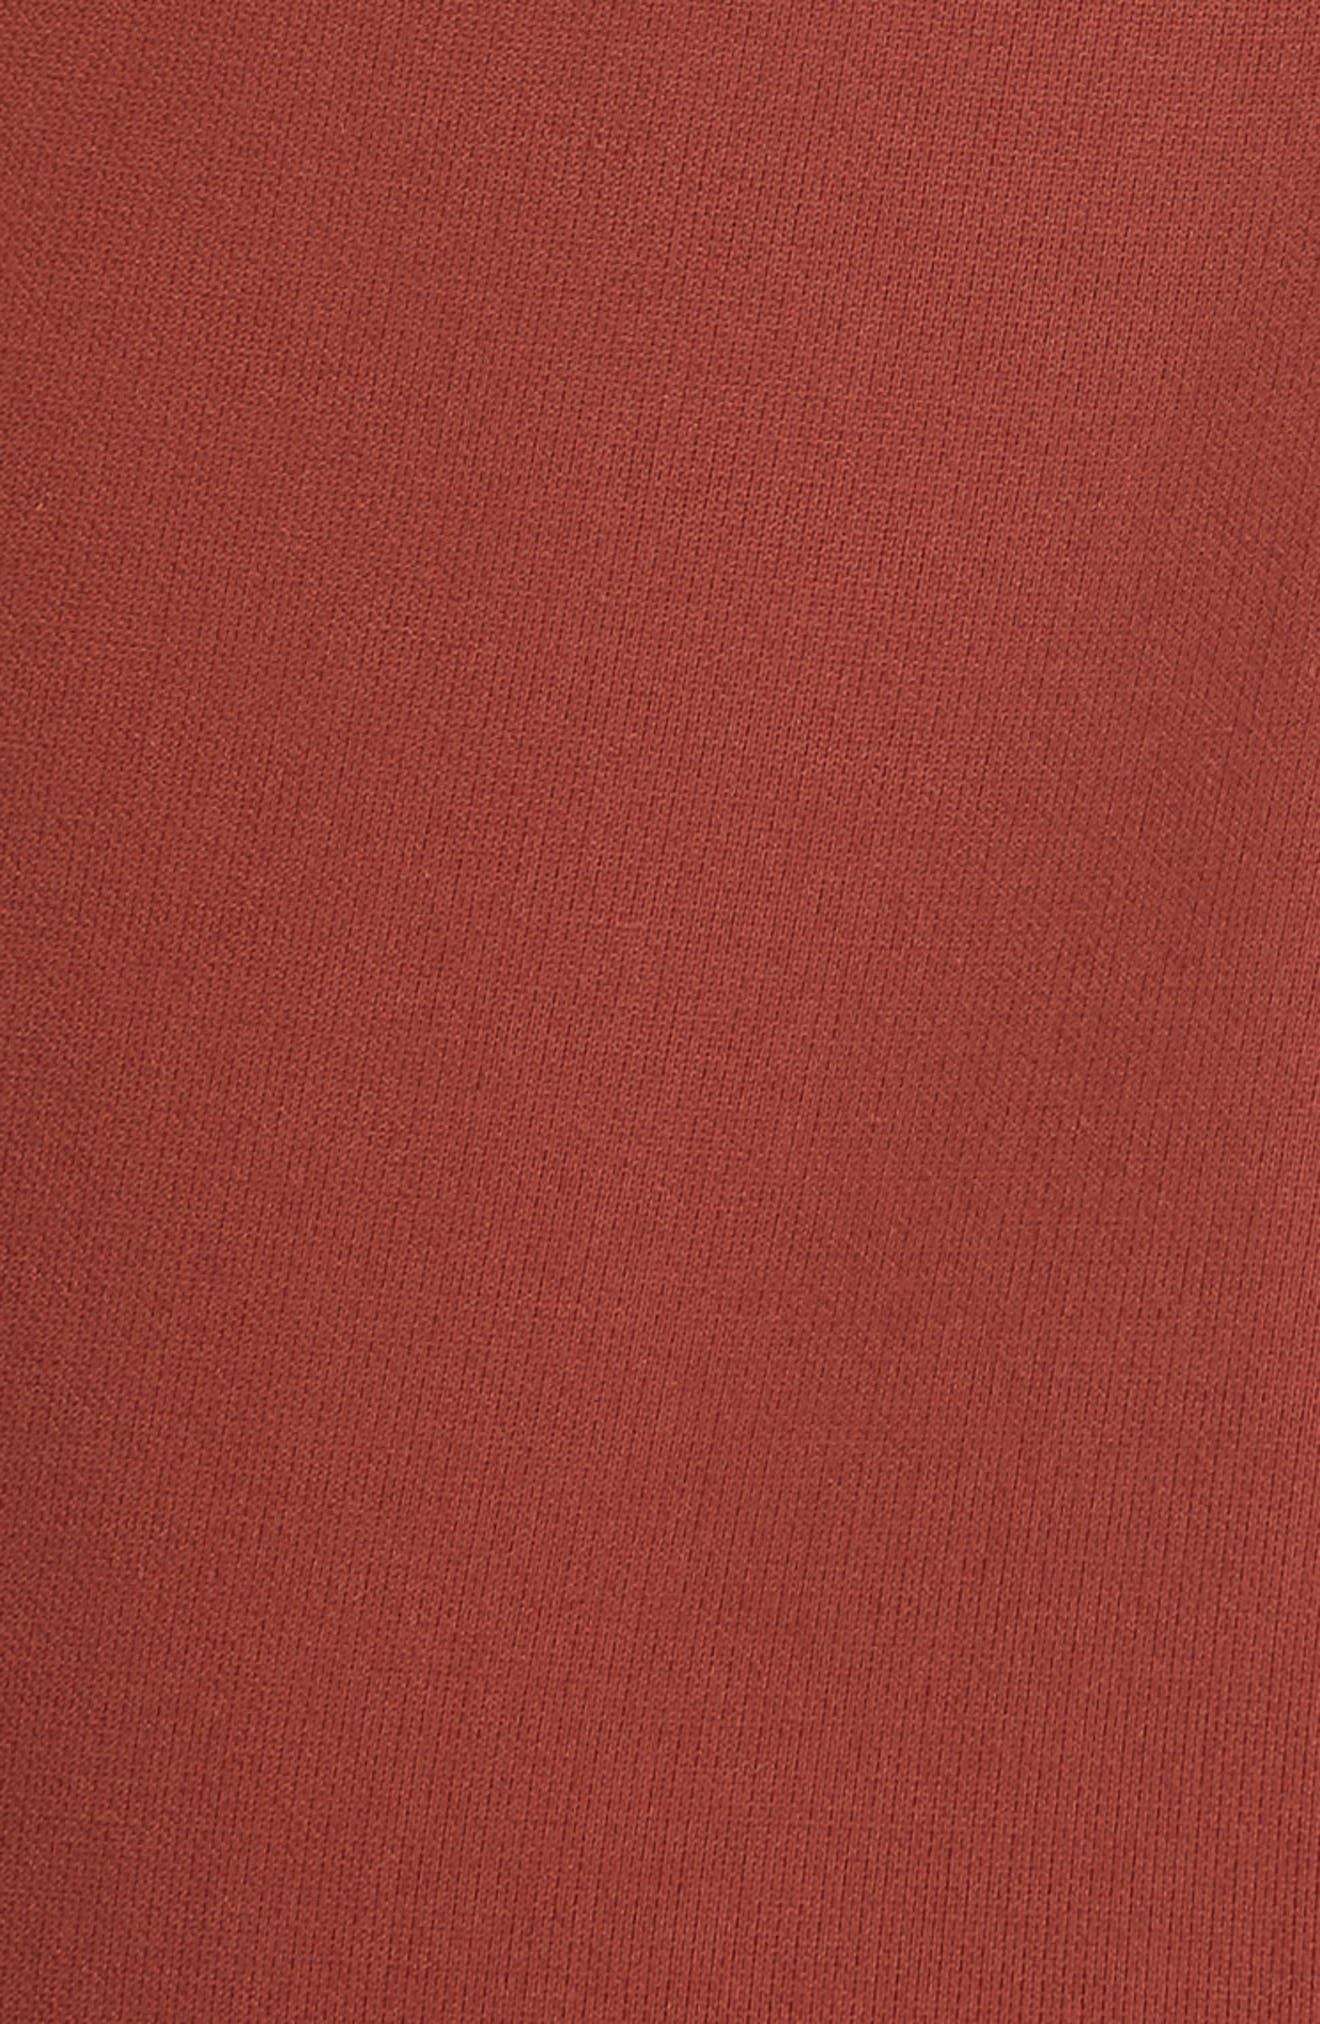 Adelise Crossover Sleeveless Sheath Dress,                             Alternate thumbnail 5, color,                             Tobacco